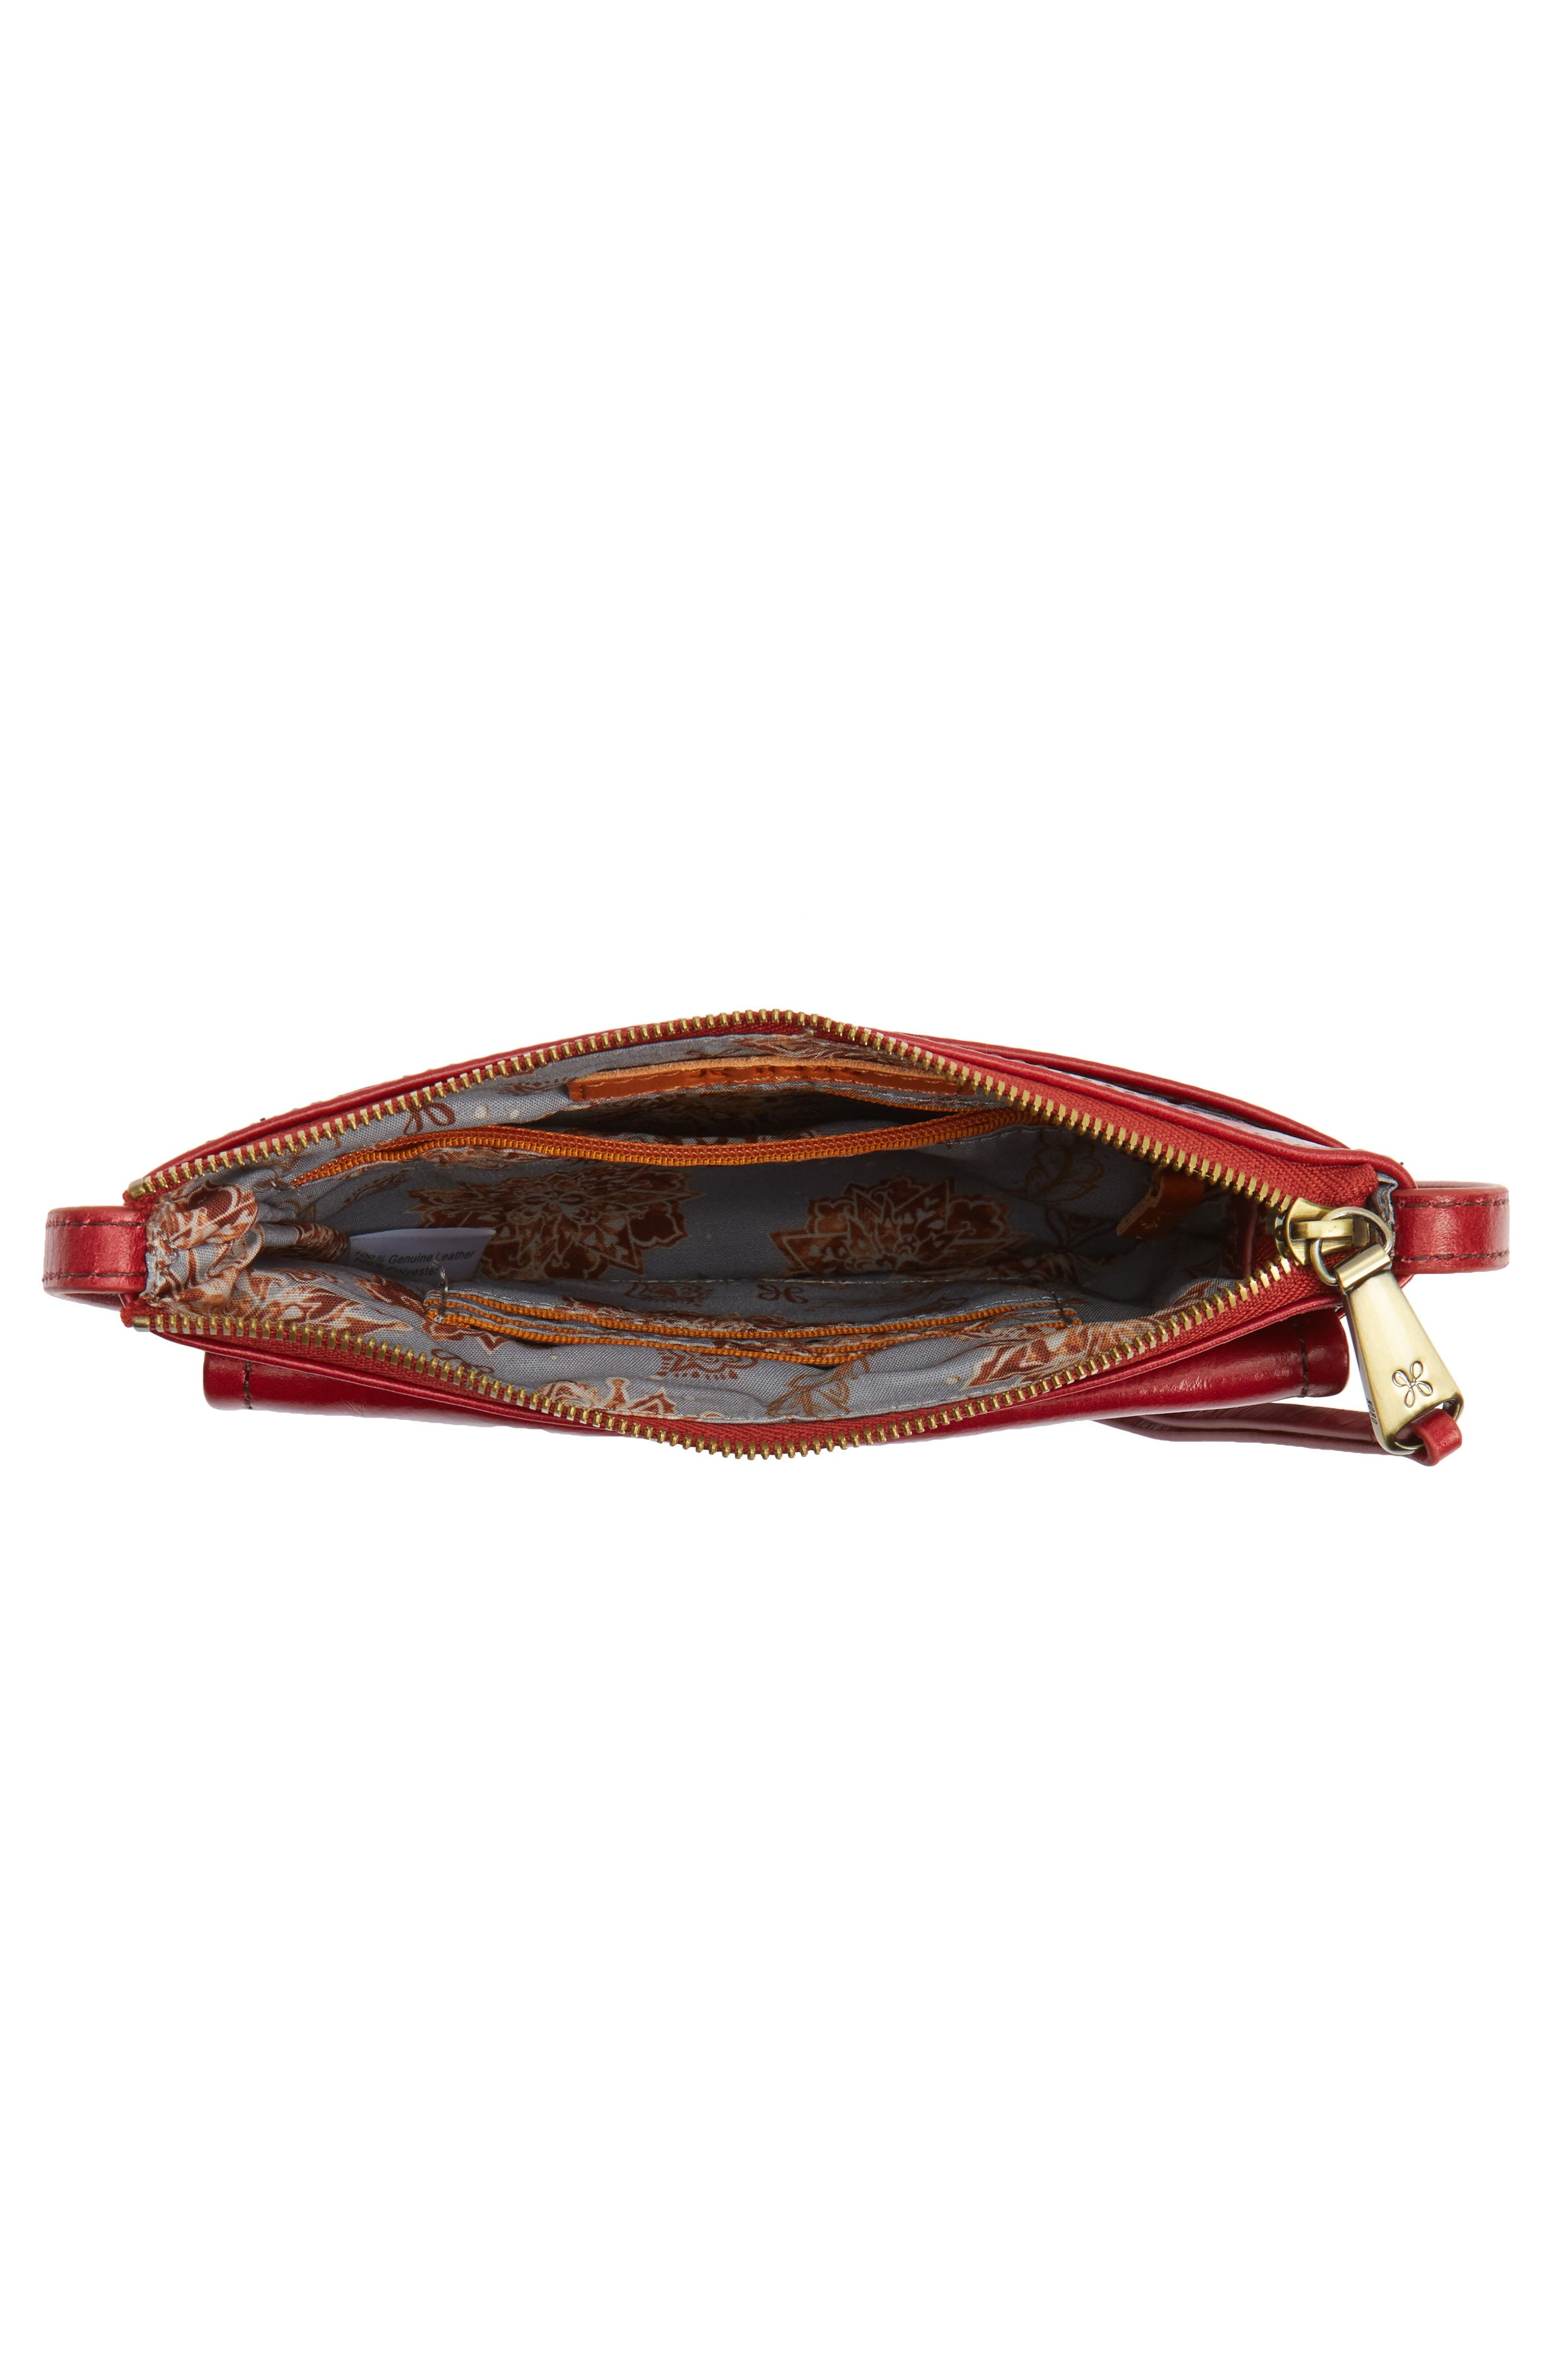 Amble Leather Crossbody Bag,                             Alternate thumbnail 43, color,